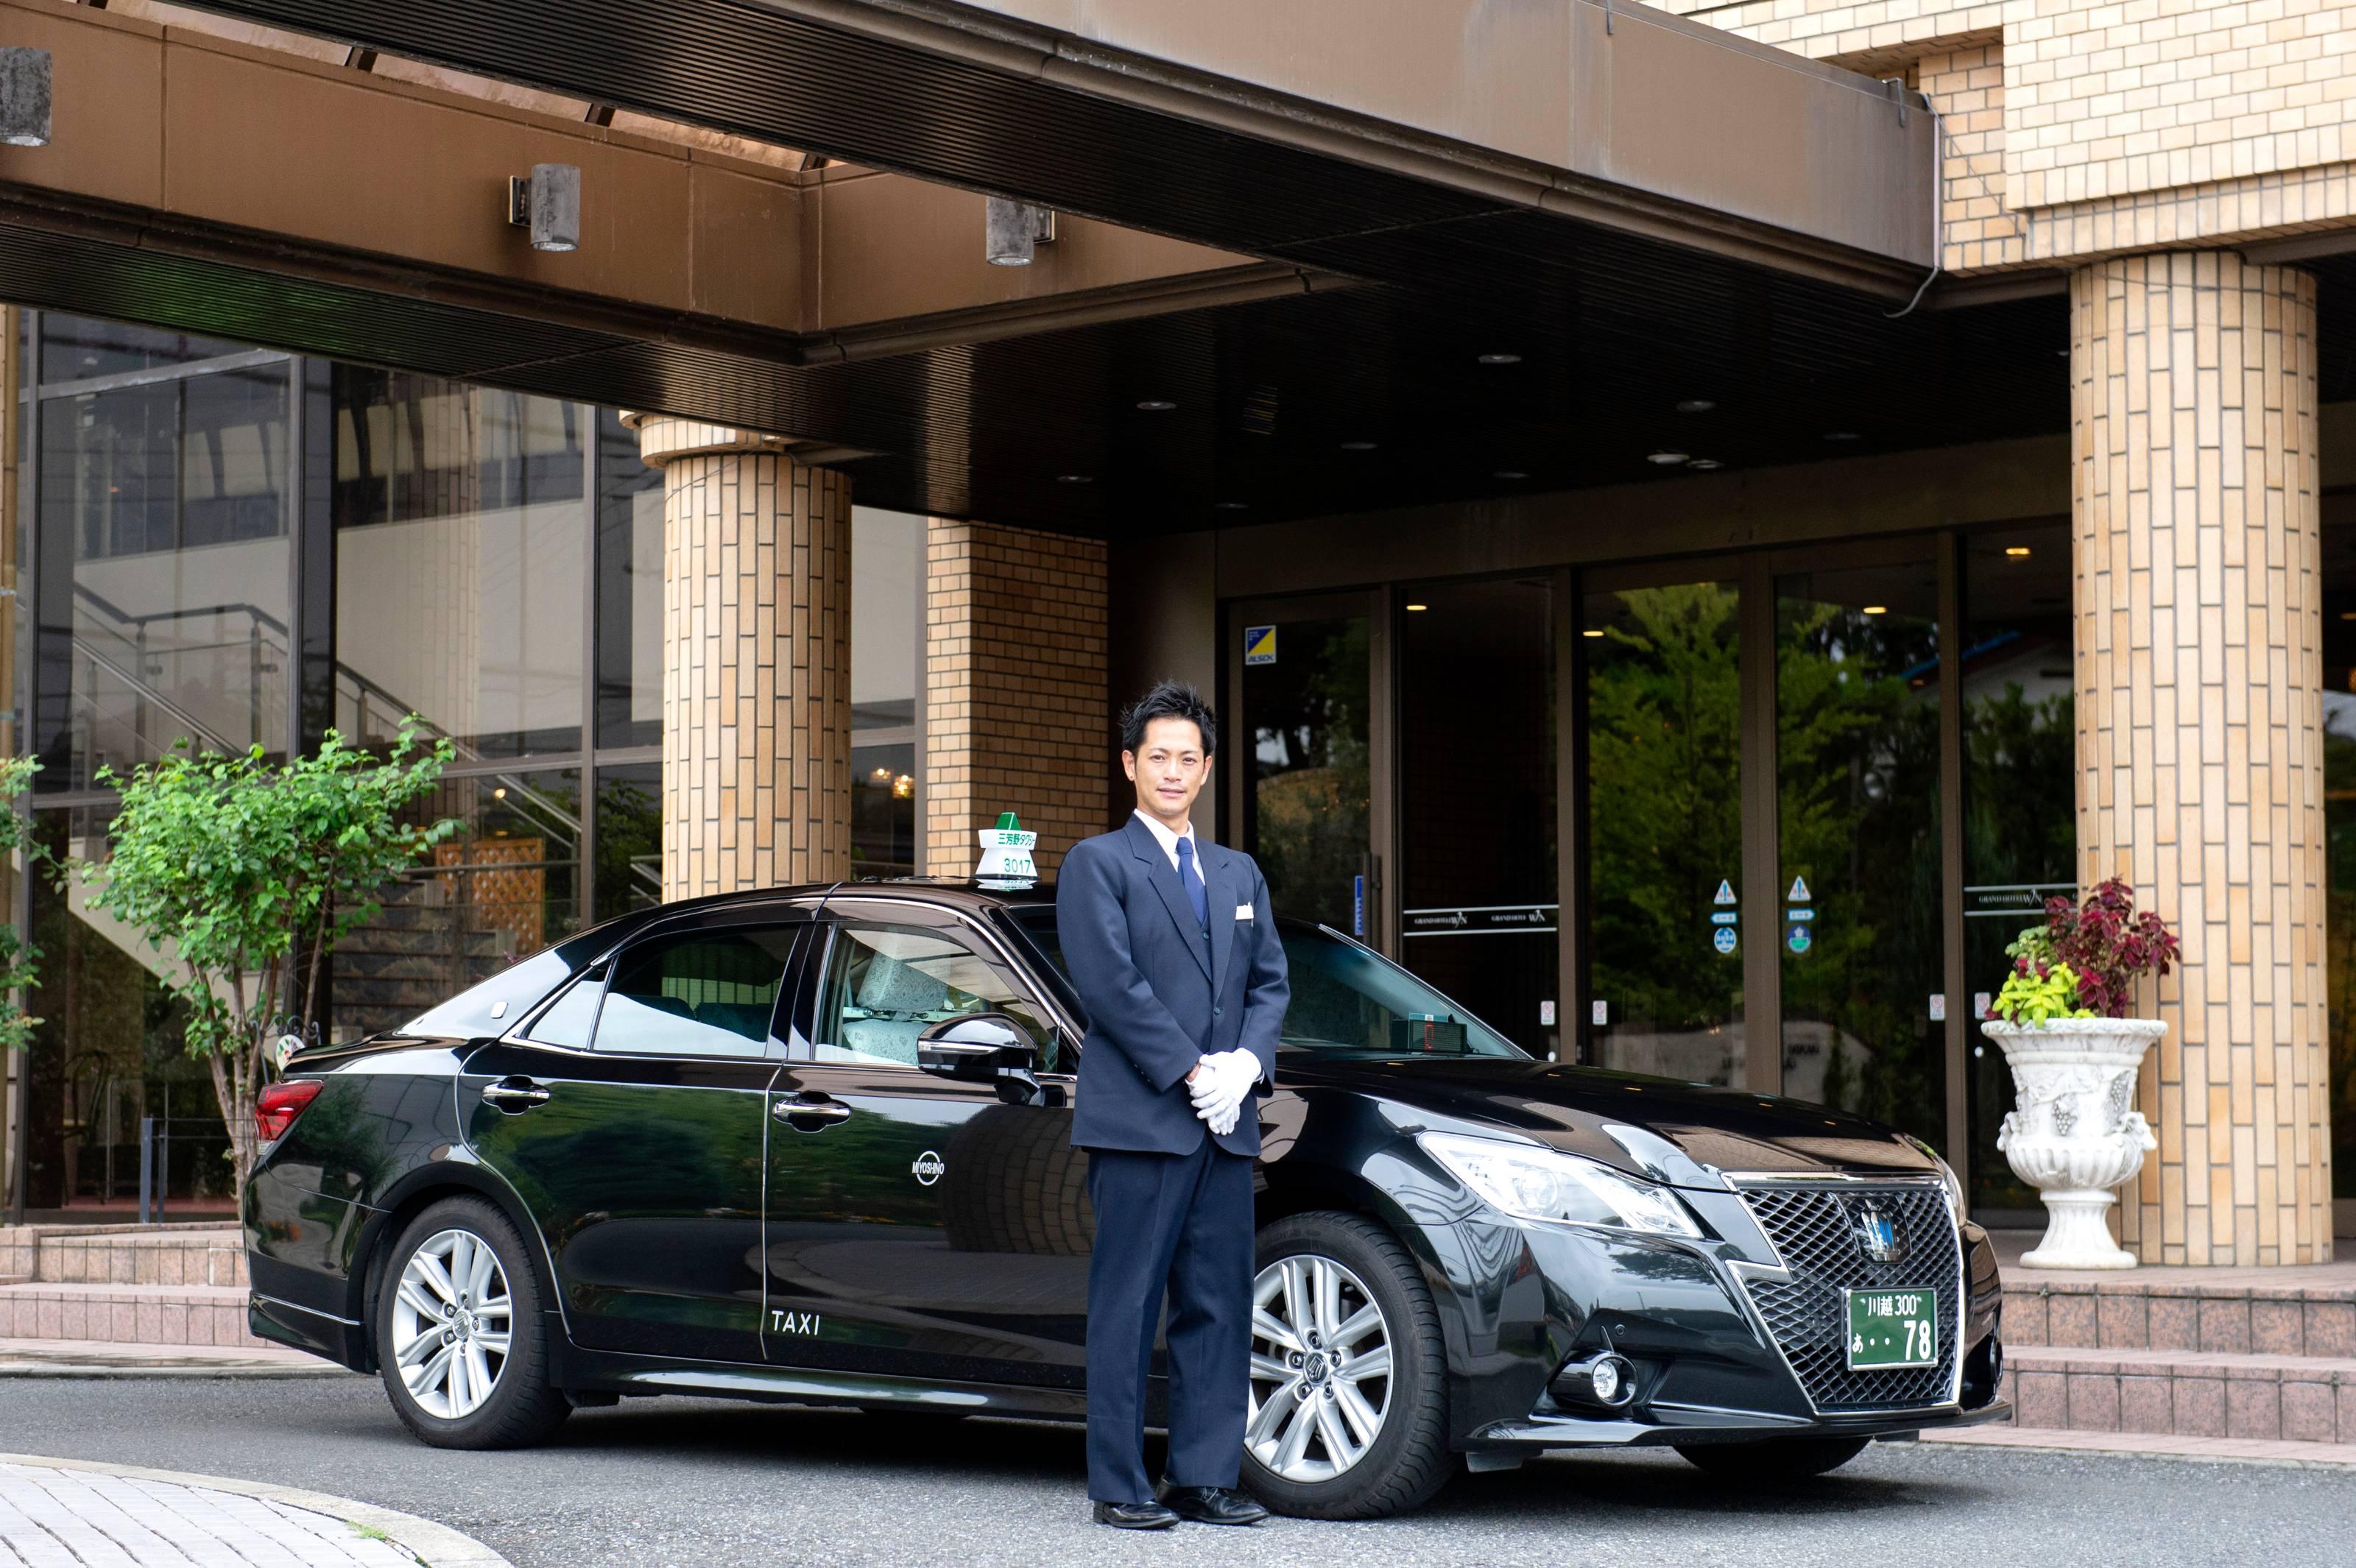 有限会社三芳野タクシー